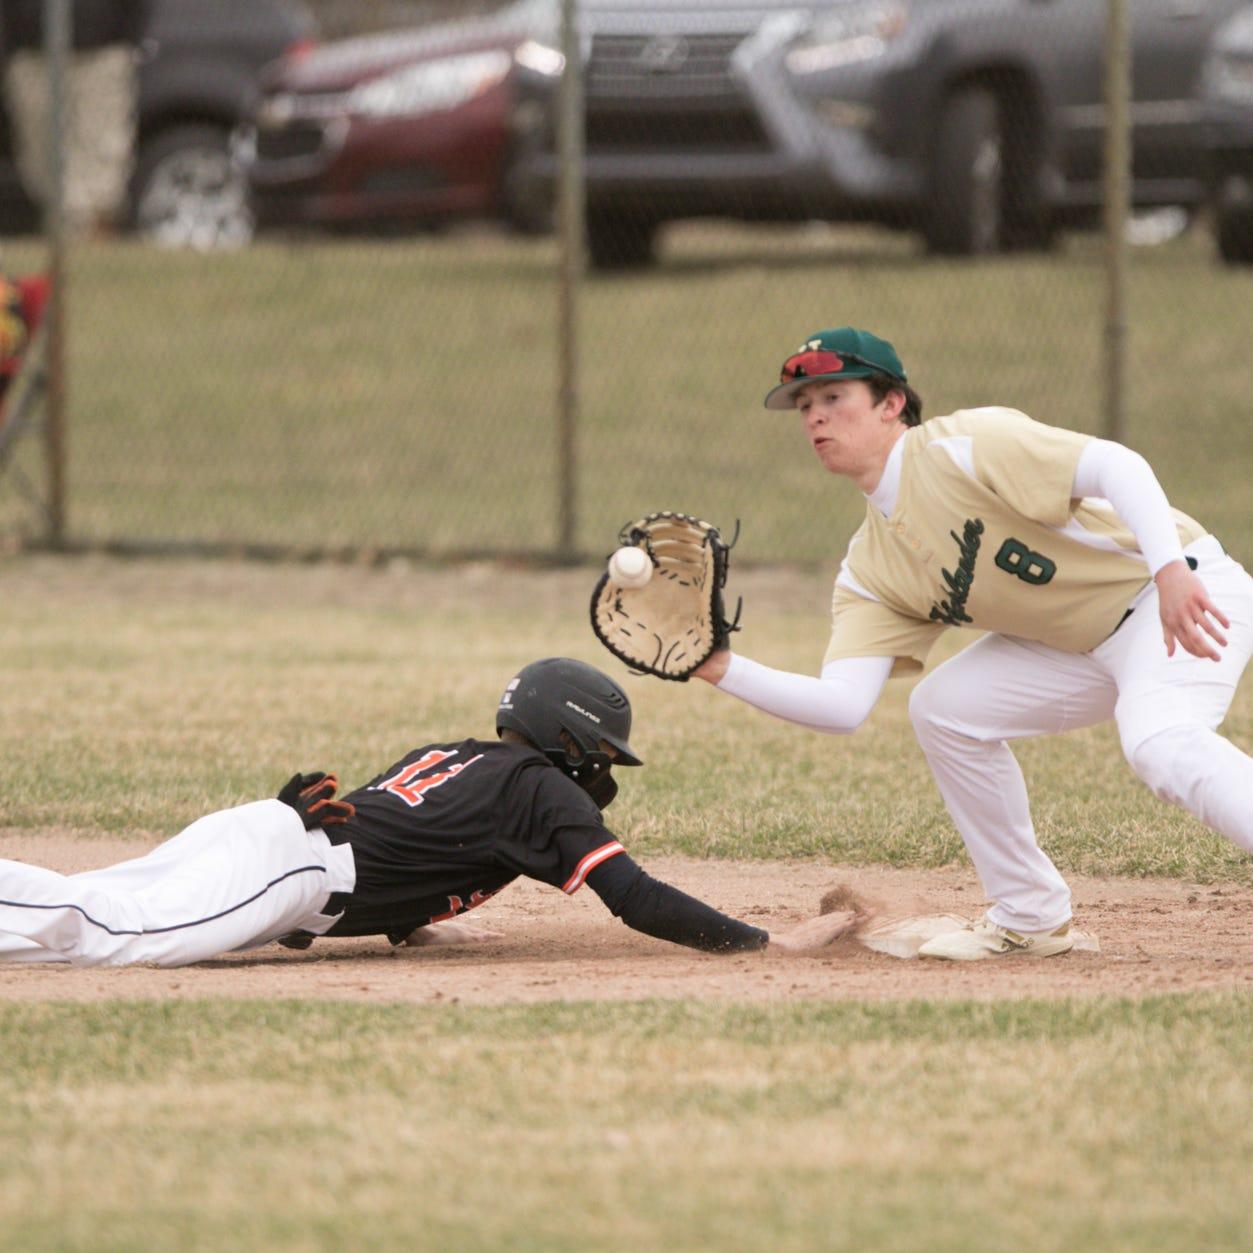 Sophomore's walk-off single in 8th completes Howell baseball comeback vs. Brighton